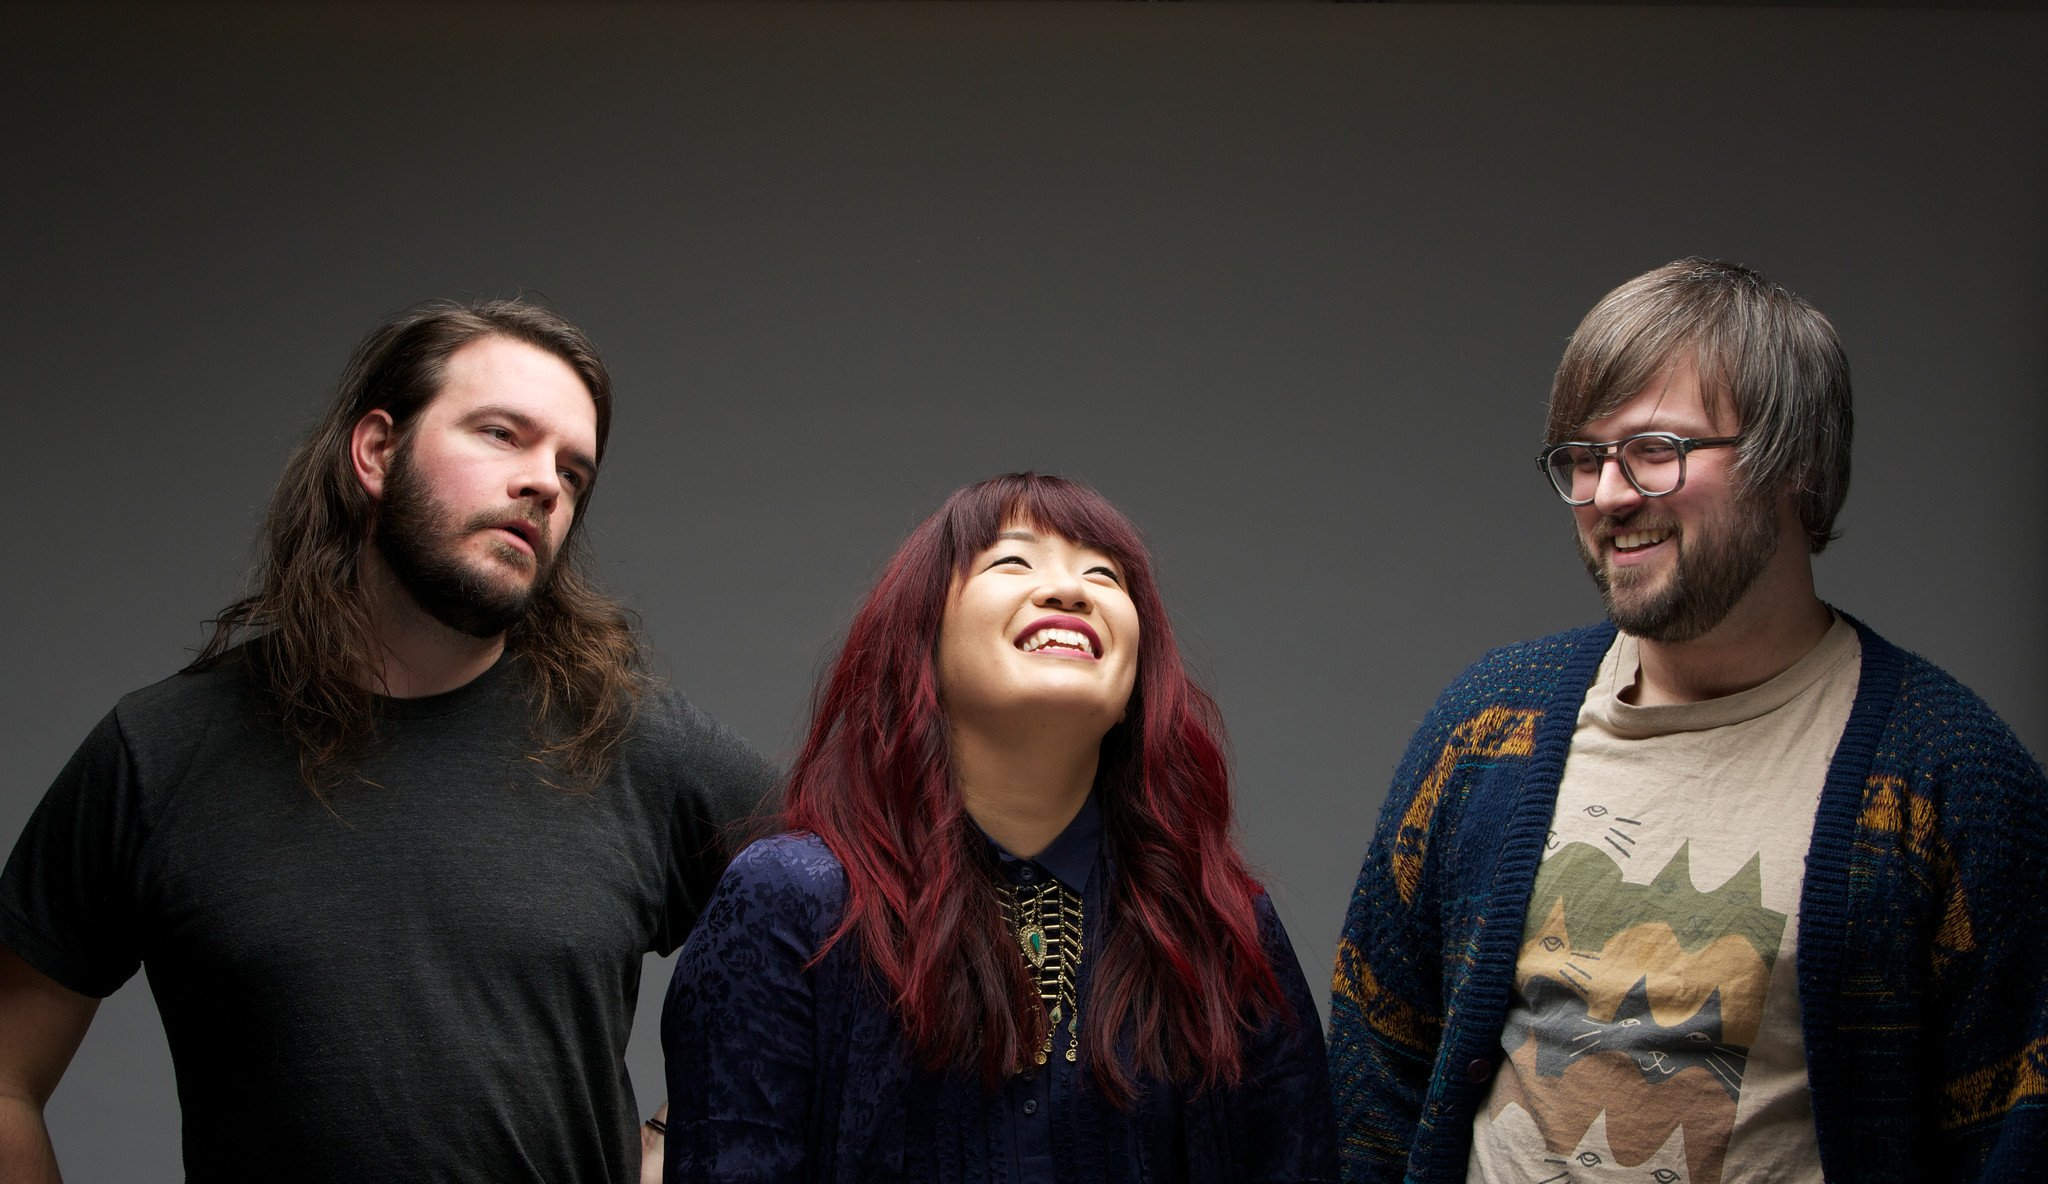 Daniel Cundiff, Nicole Yun, & Jonathan Woods